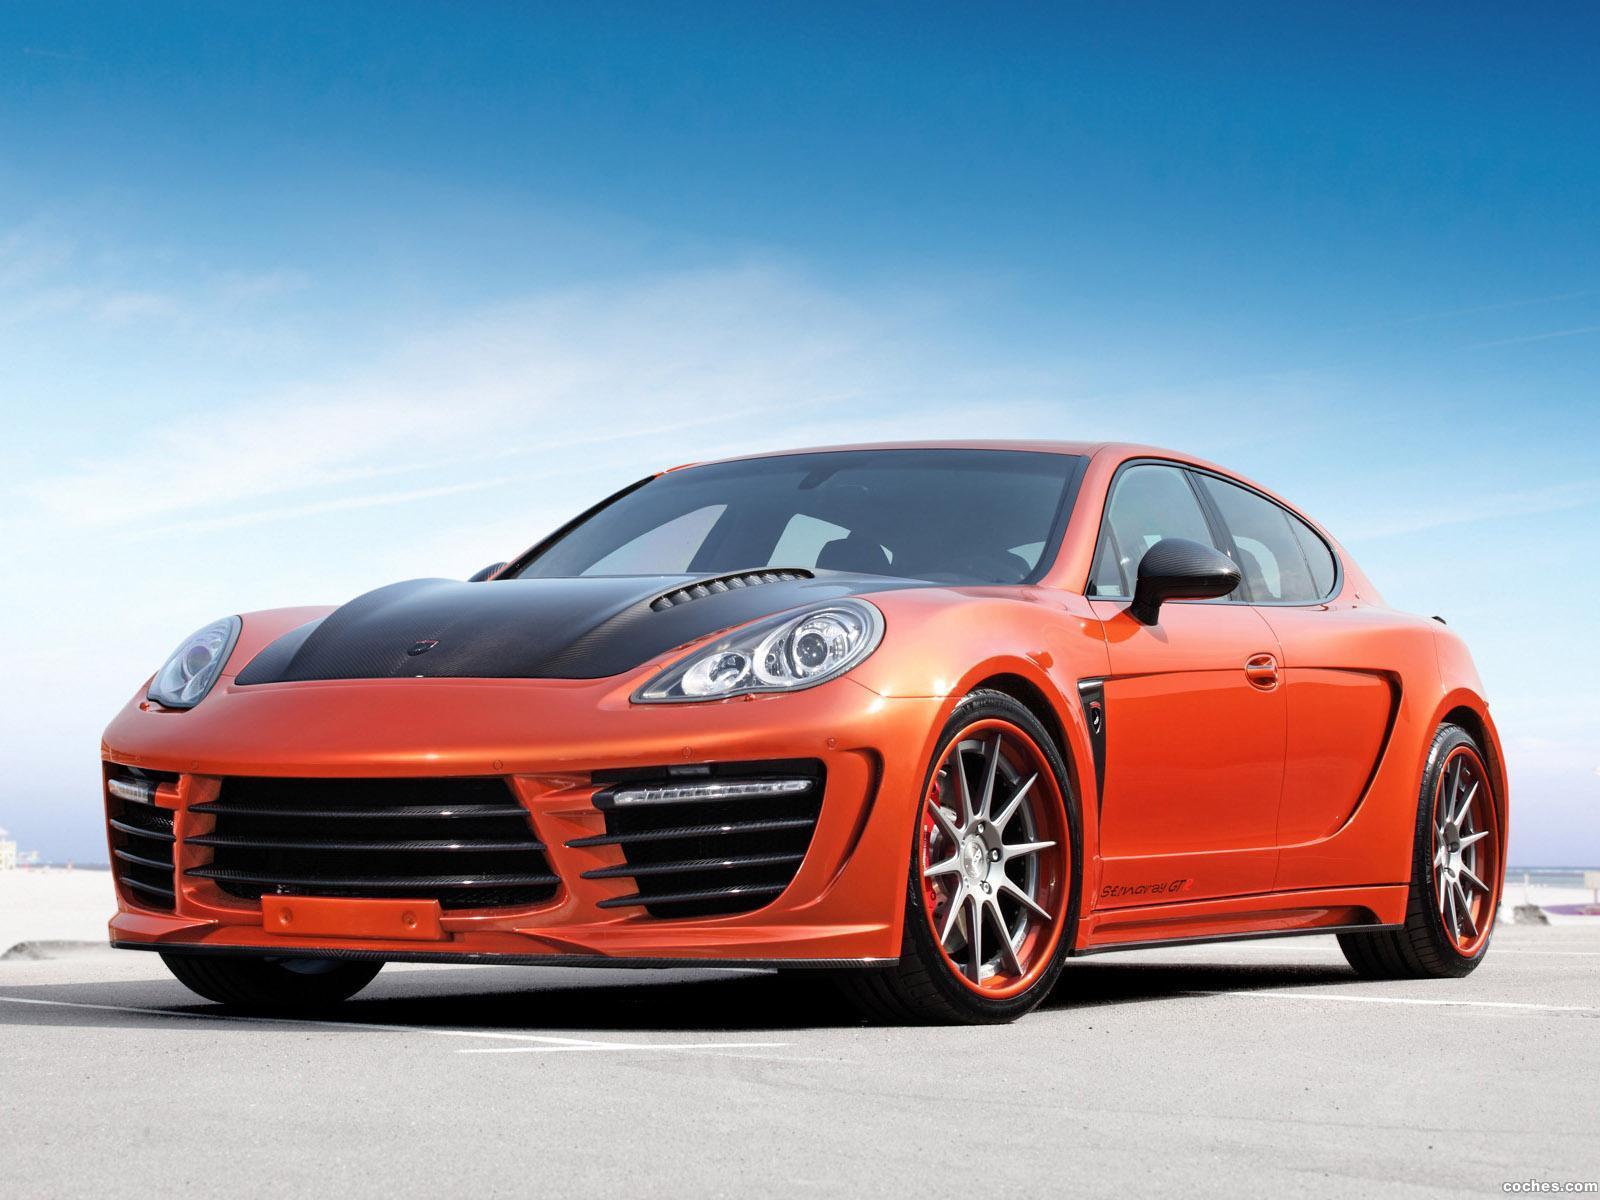 Foto 0 de Topcar Porsche Panamera Stingray GTR Orange 2012